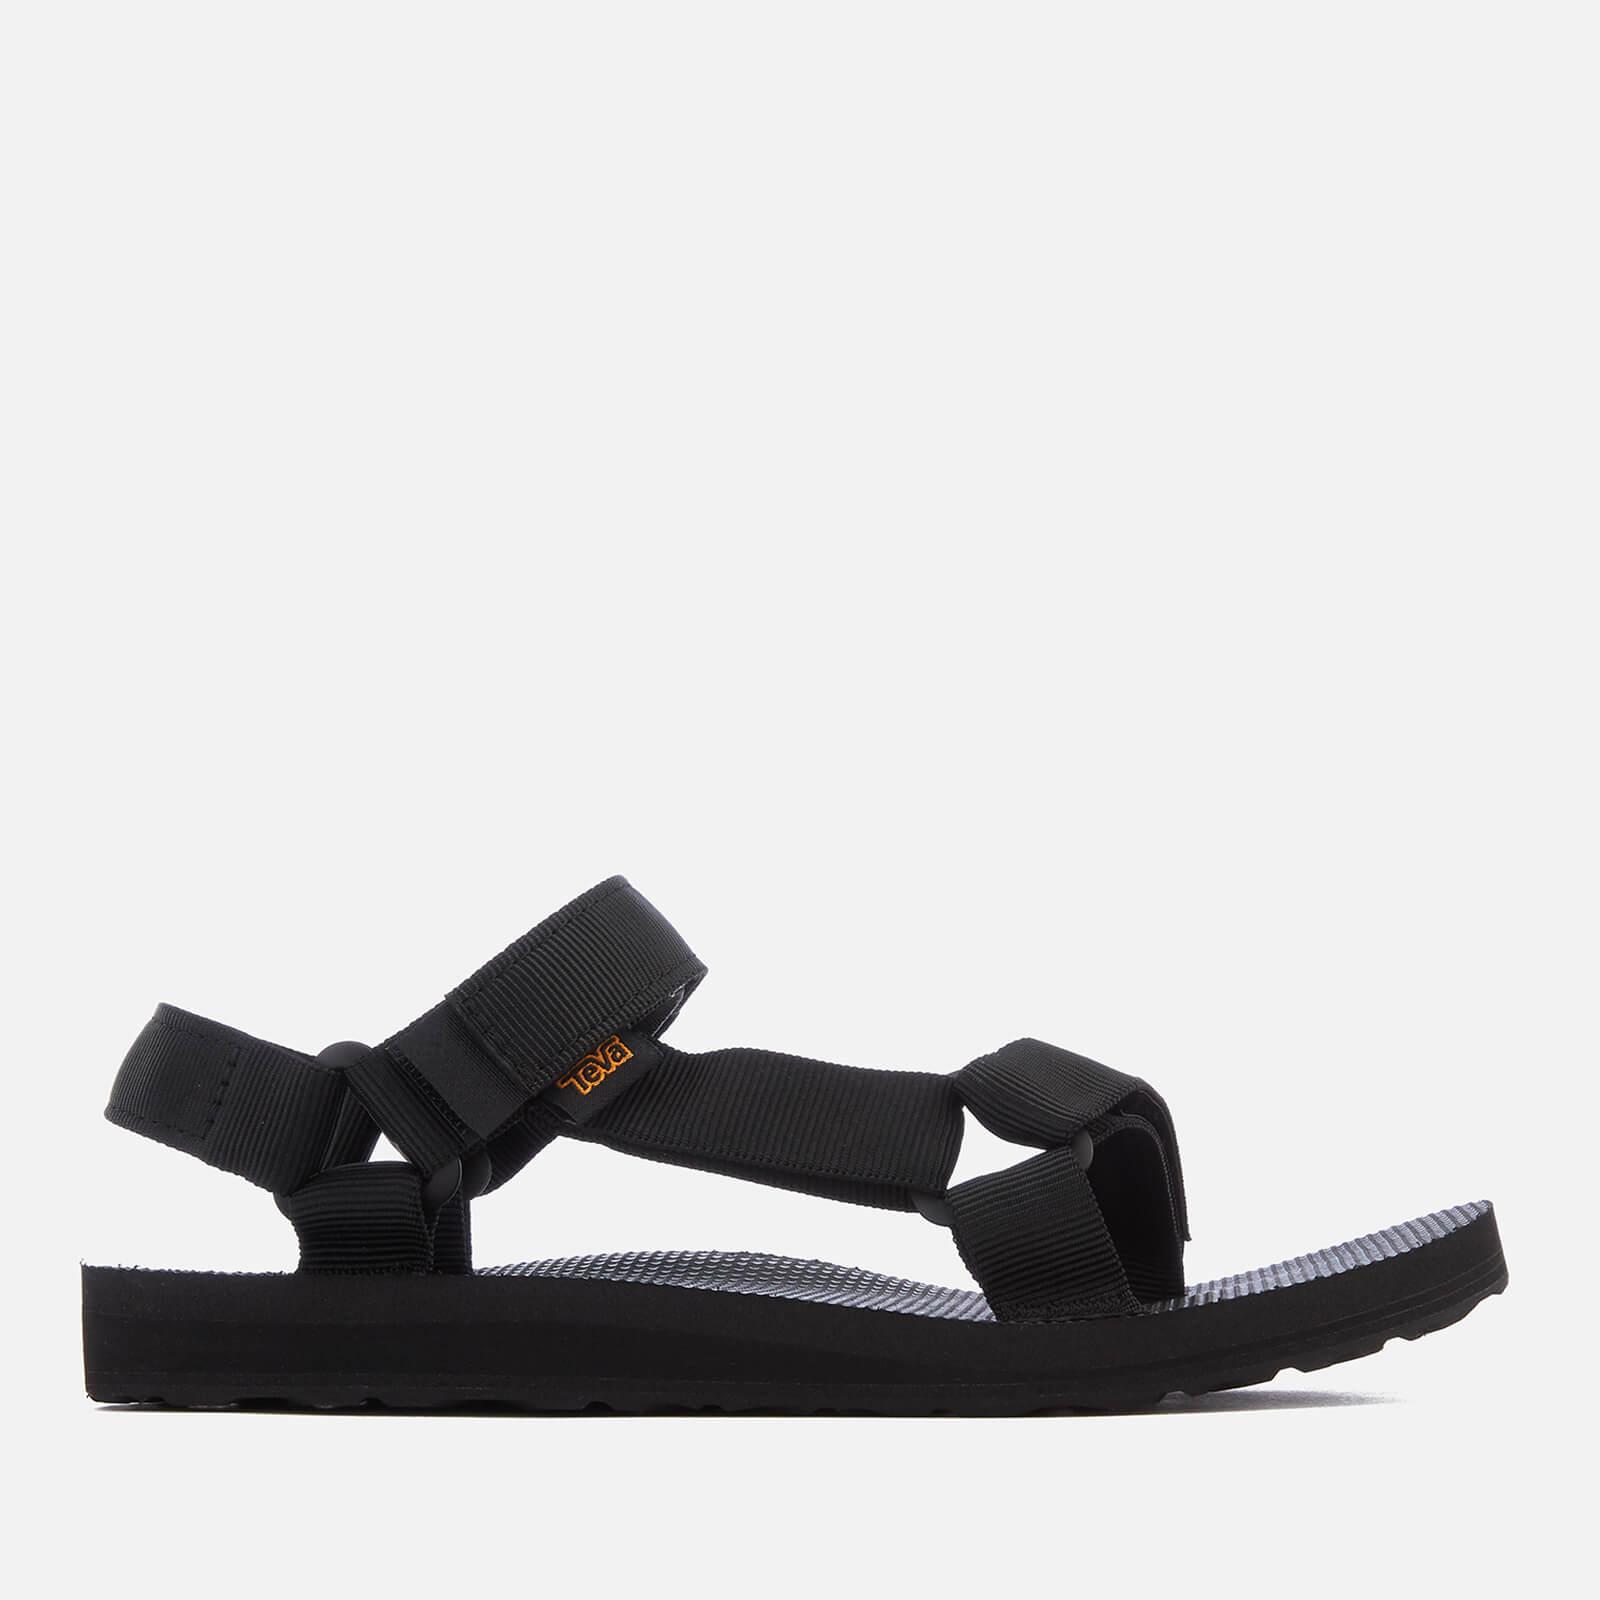 Teva Women's Original Universal Sport Sandals - Black - UK 7